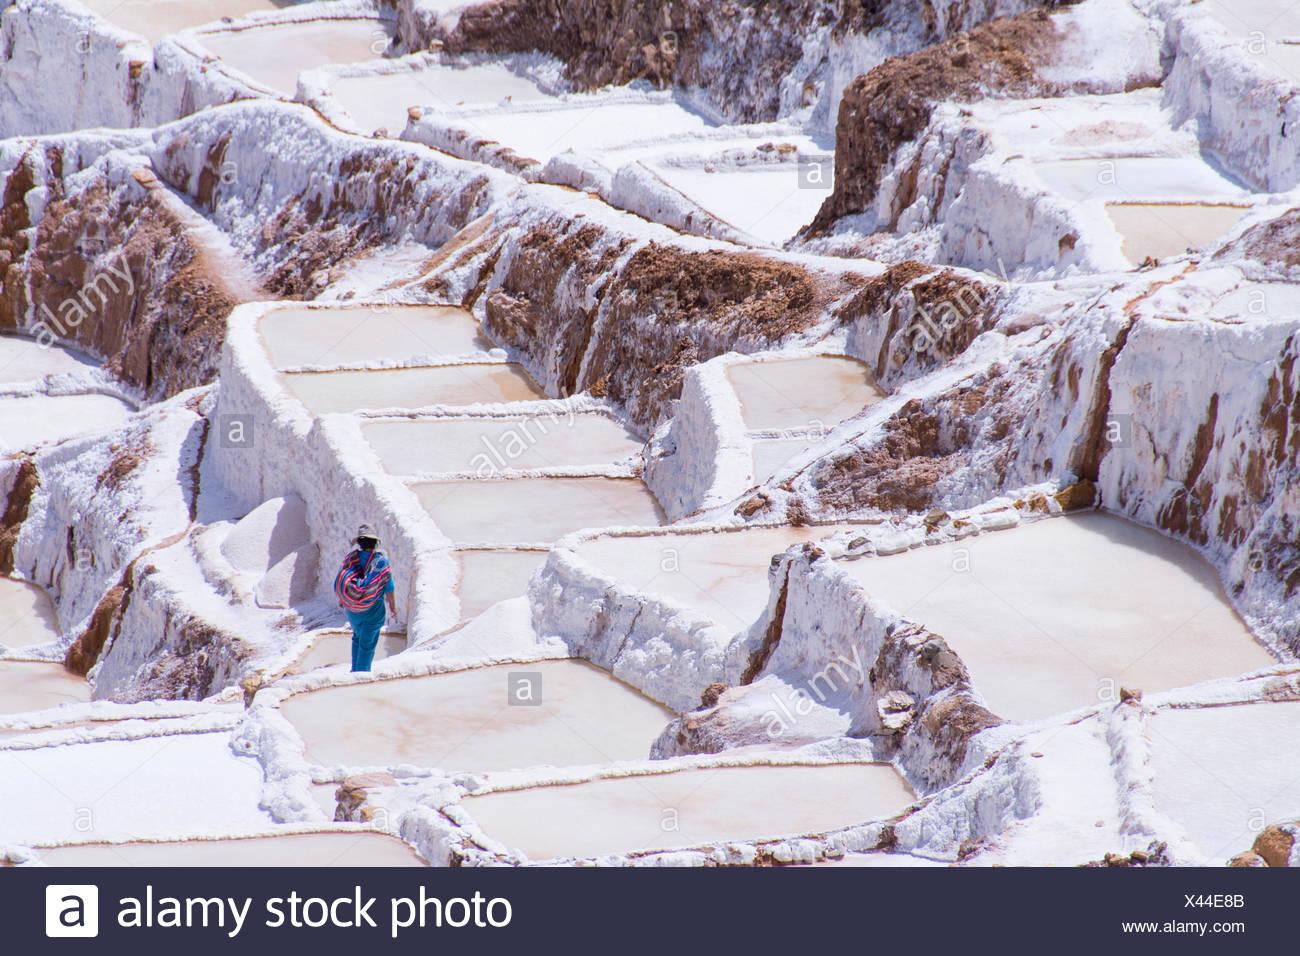 Salt pond mines of Maras, 40kilometers north of Cuzco, in the Cuzco Region of Peru - Stock Image